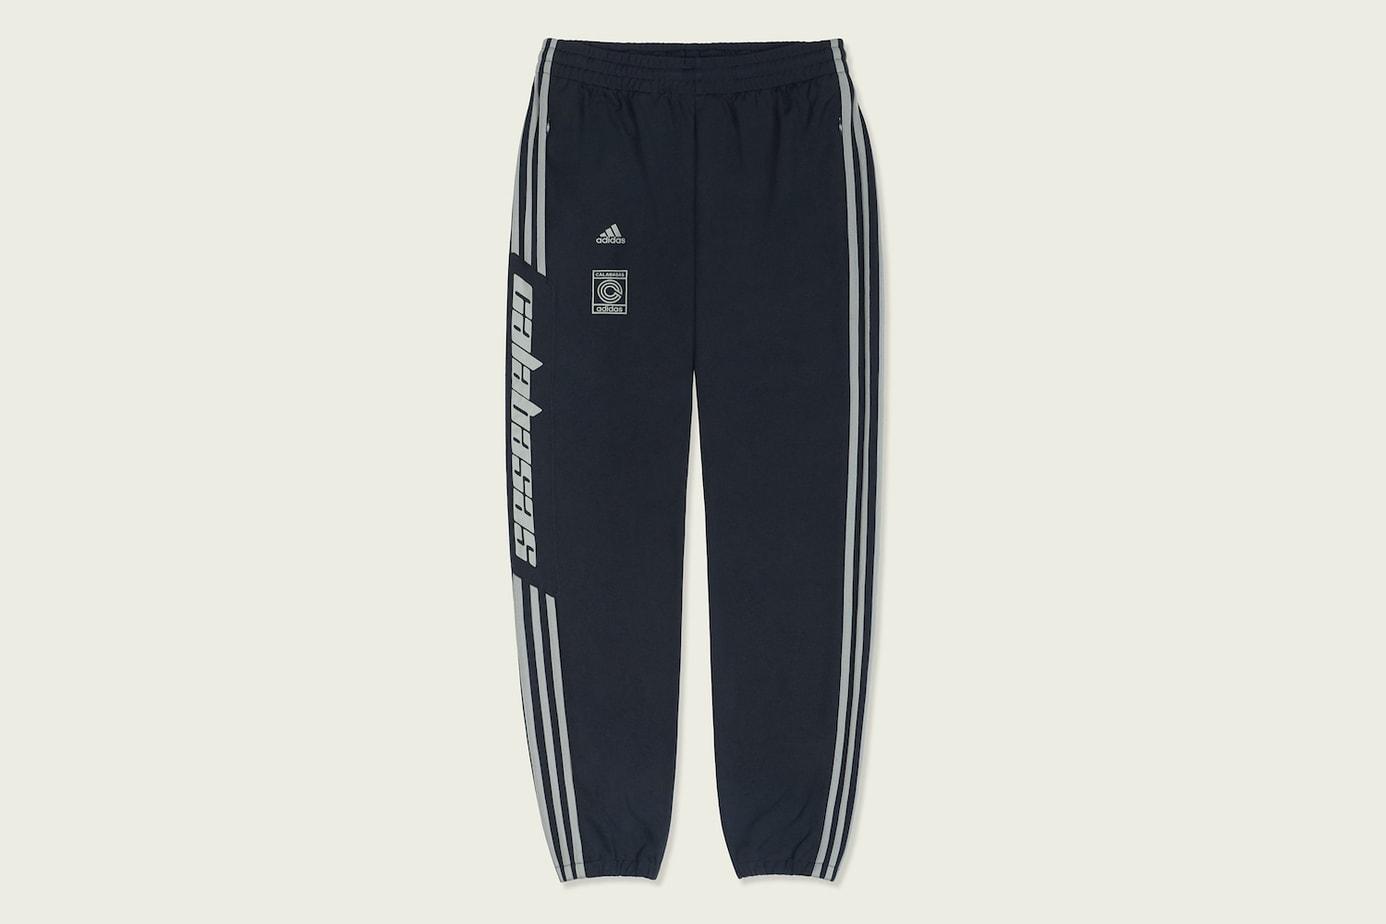 9eda059b8000c adidas Yeezy Calabasas Track Pants Online Links - JustFreshKicks